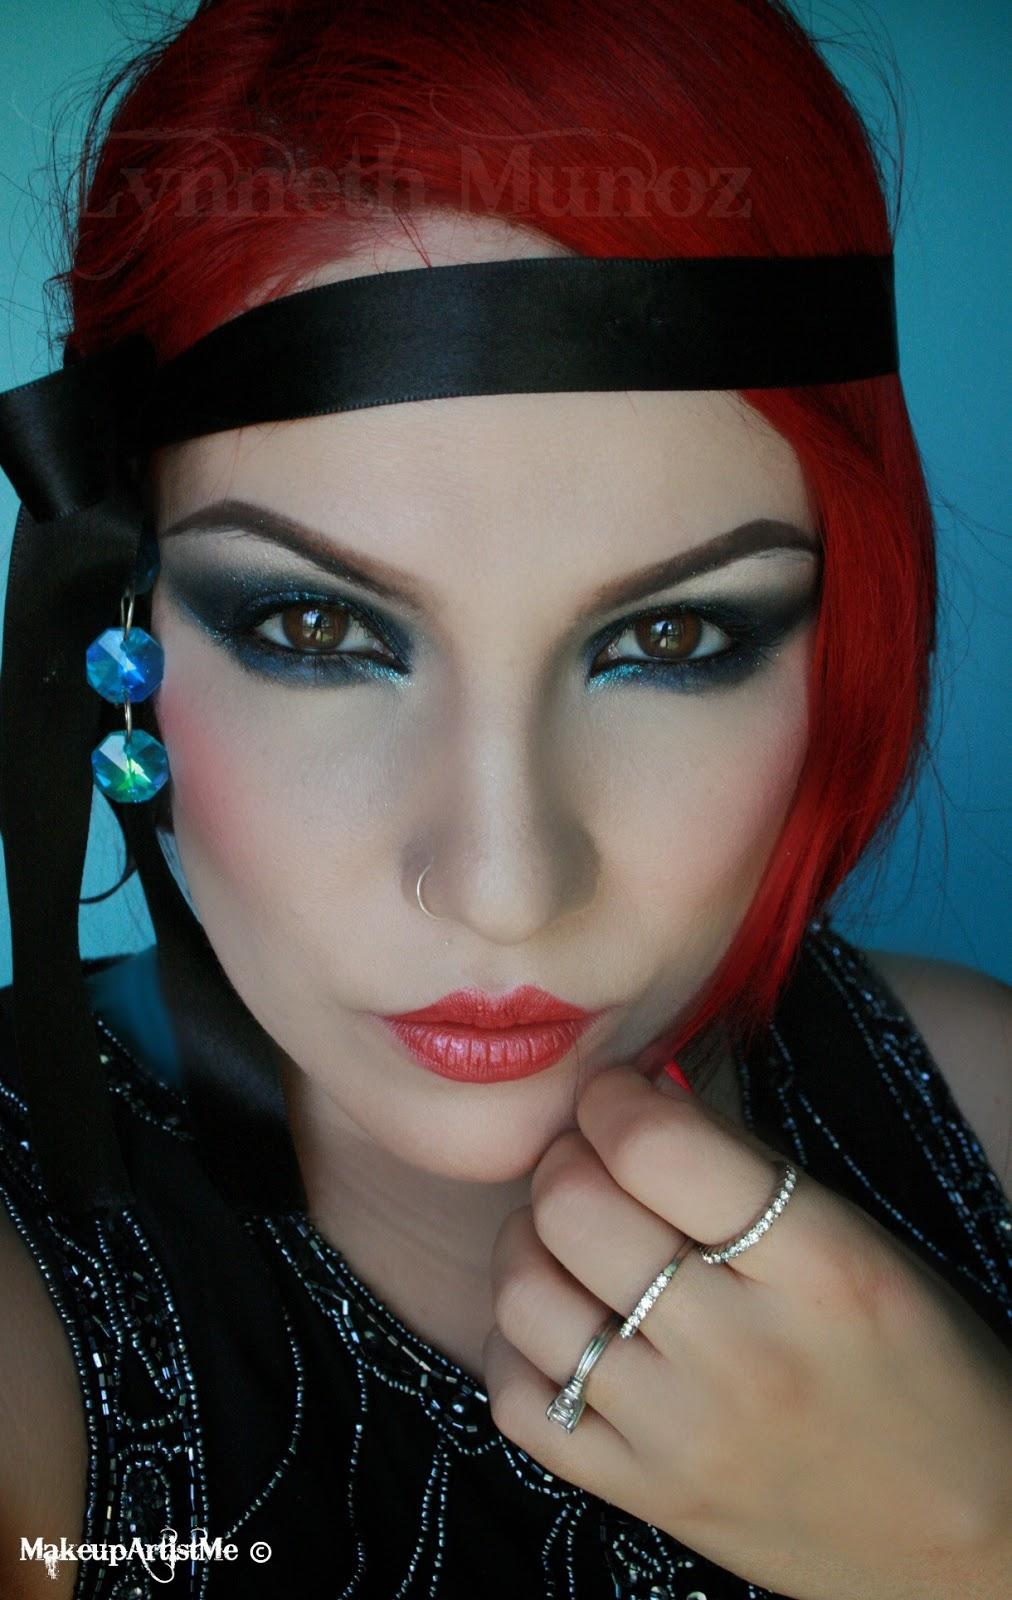 Make-up Artist Me!: 1920s Dramatic Makeup look